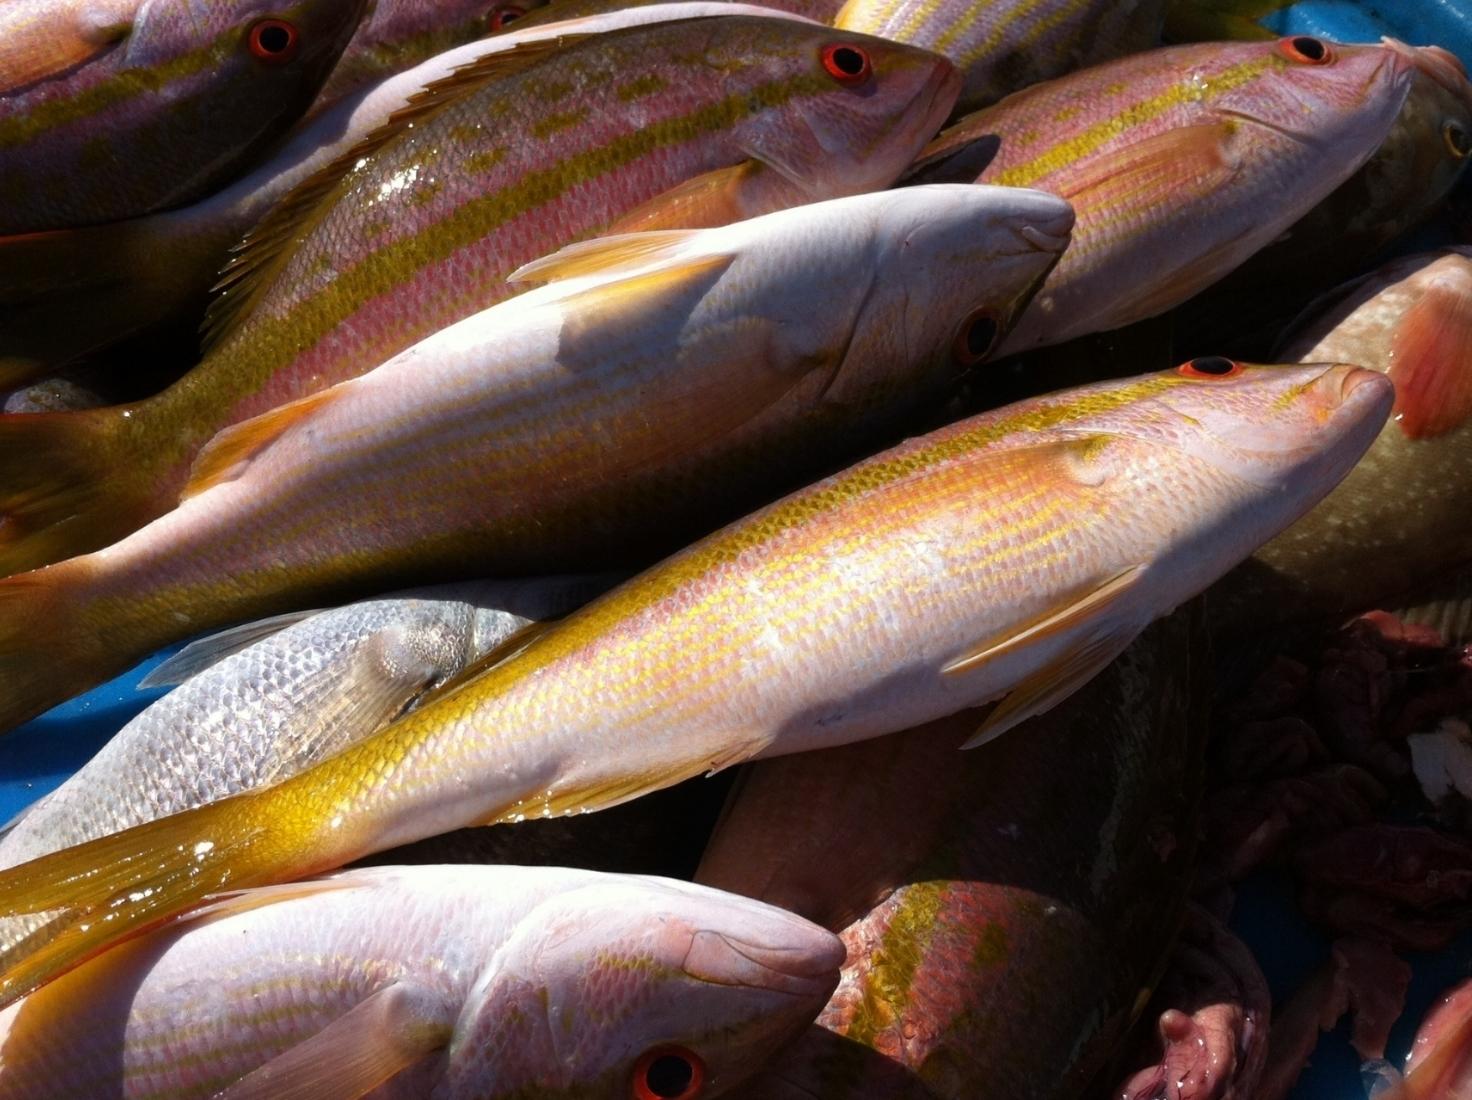 Fish from Rio Lagartos, Yucatan